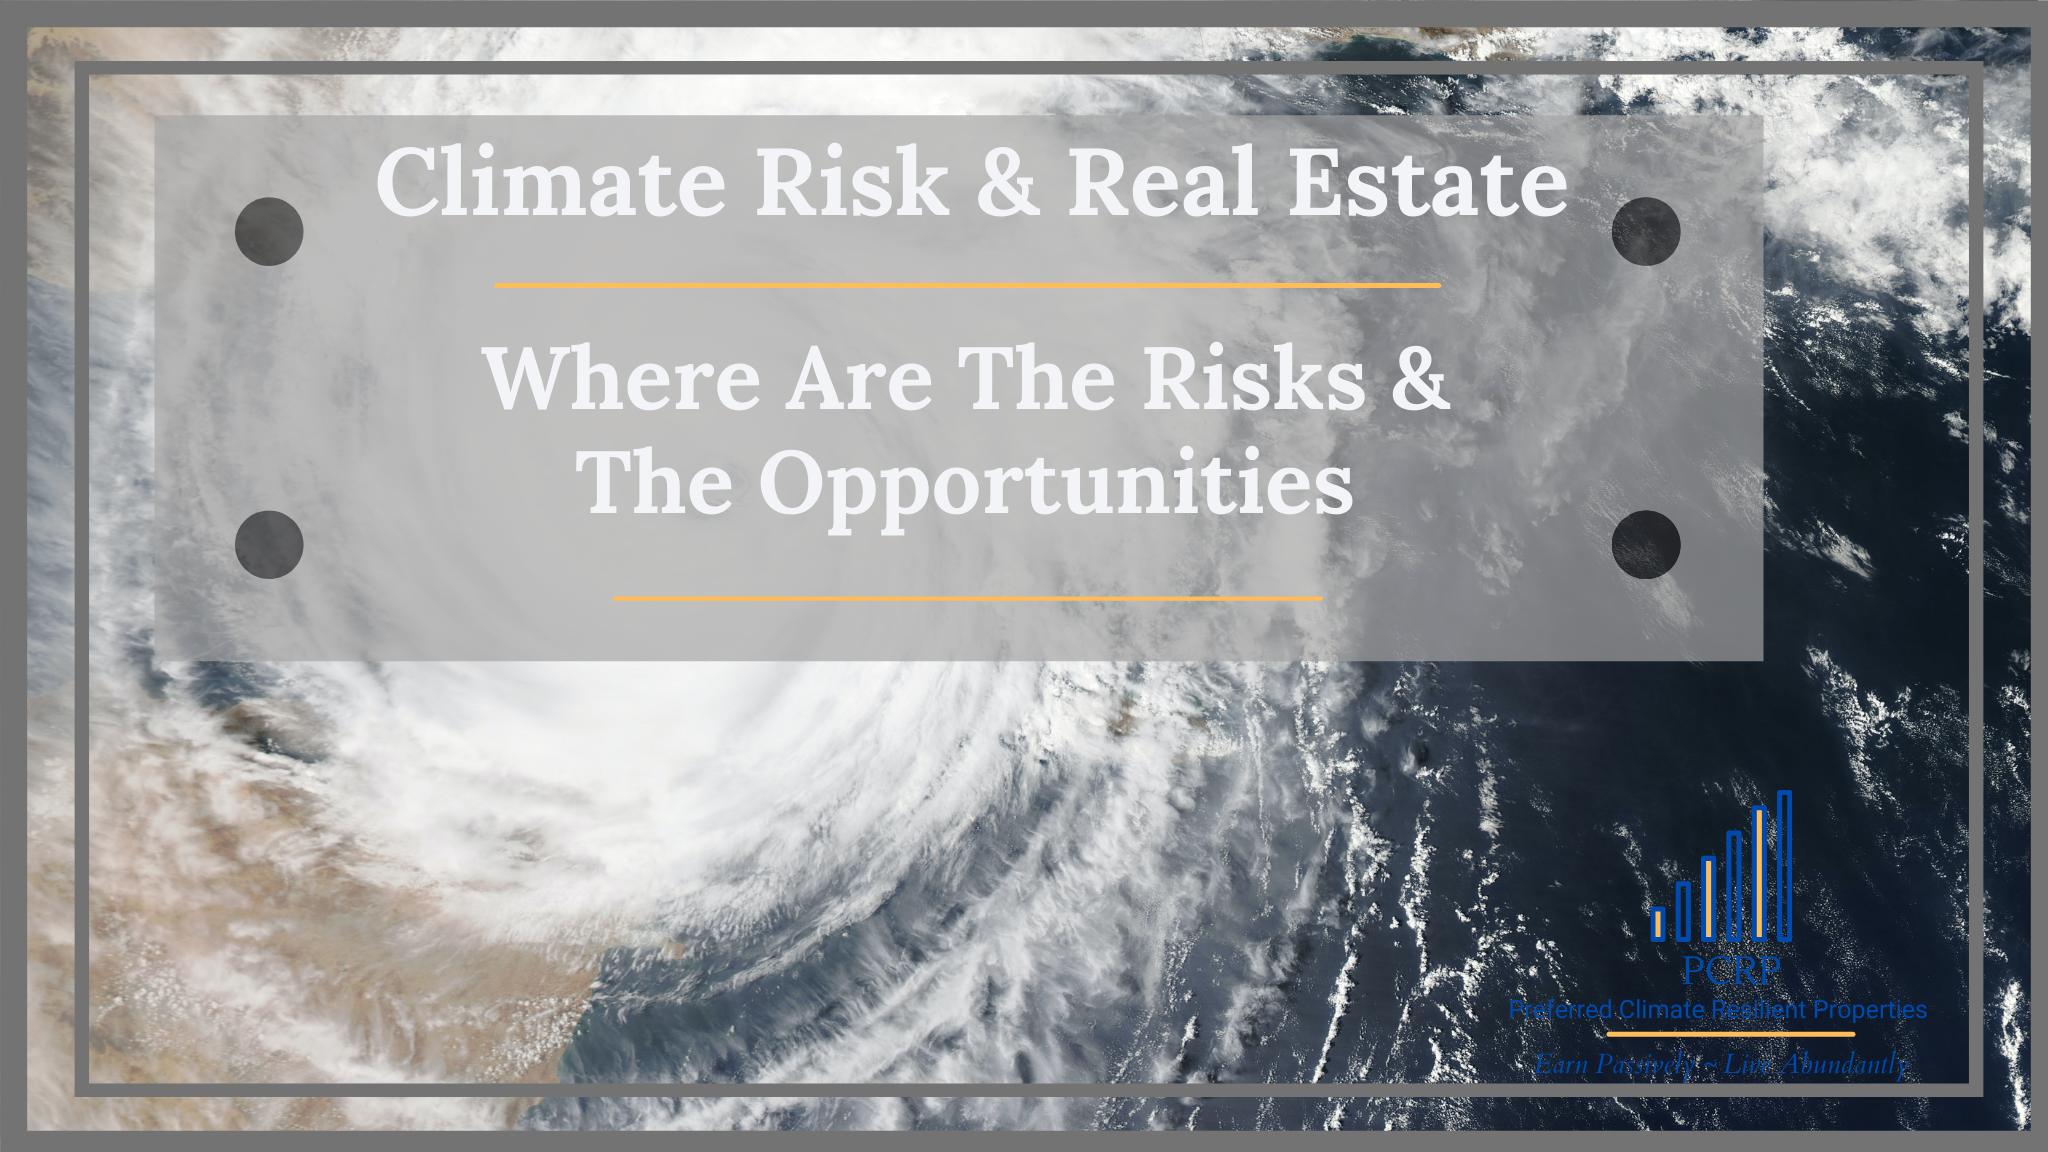 Climate Risk & Real Estate